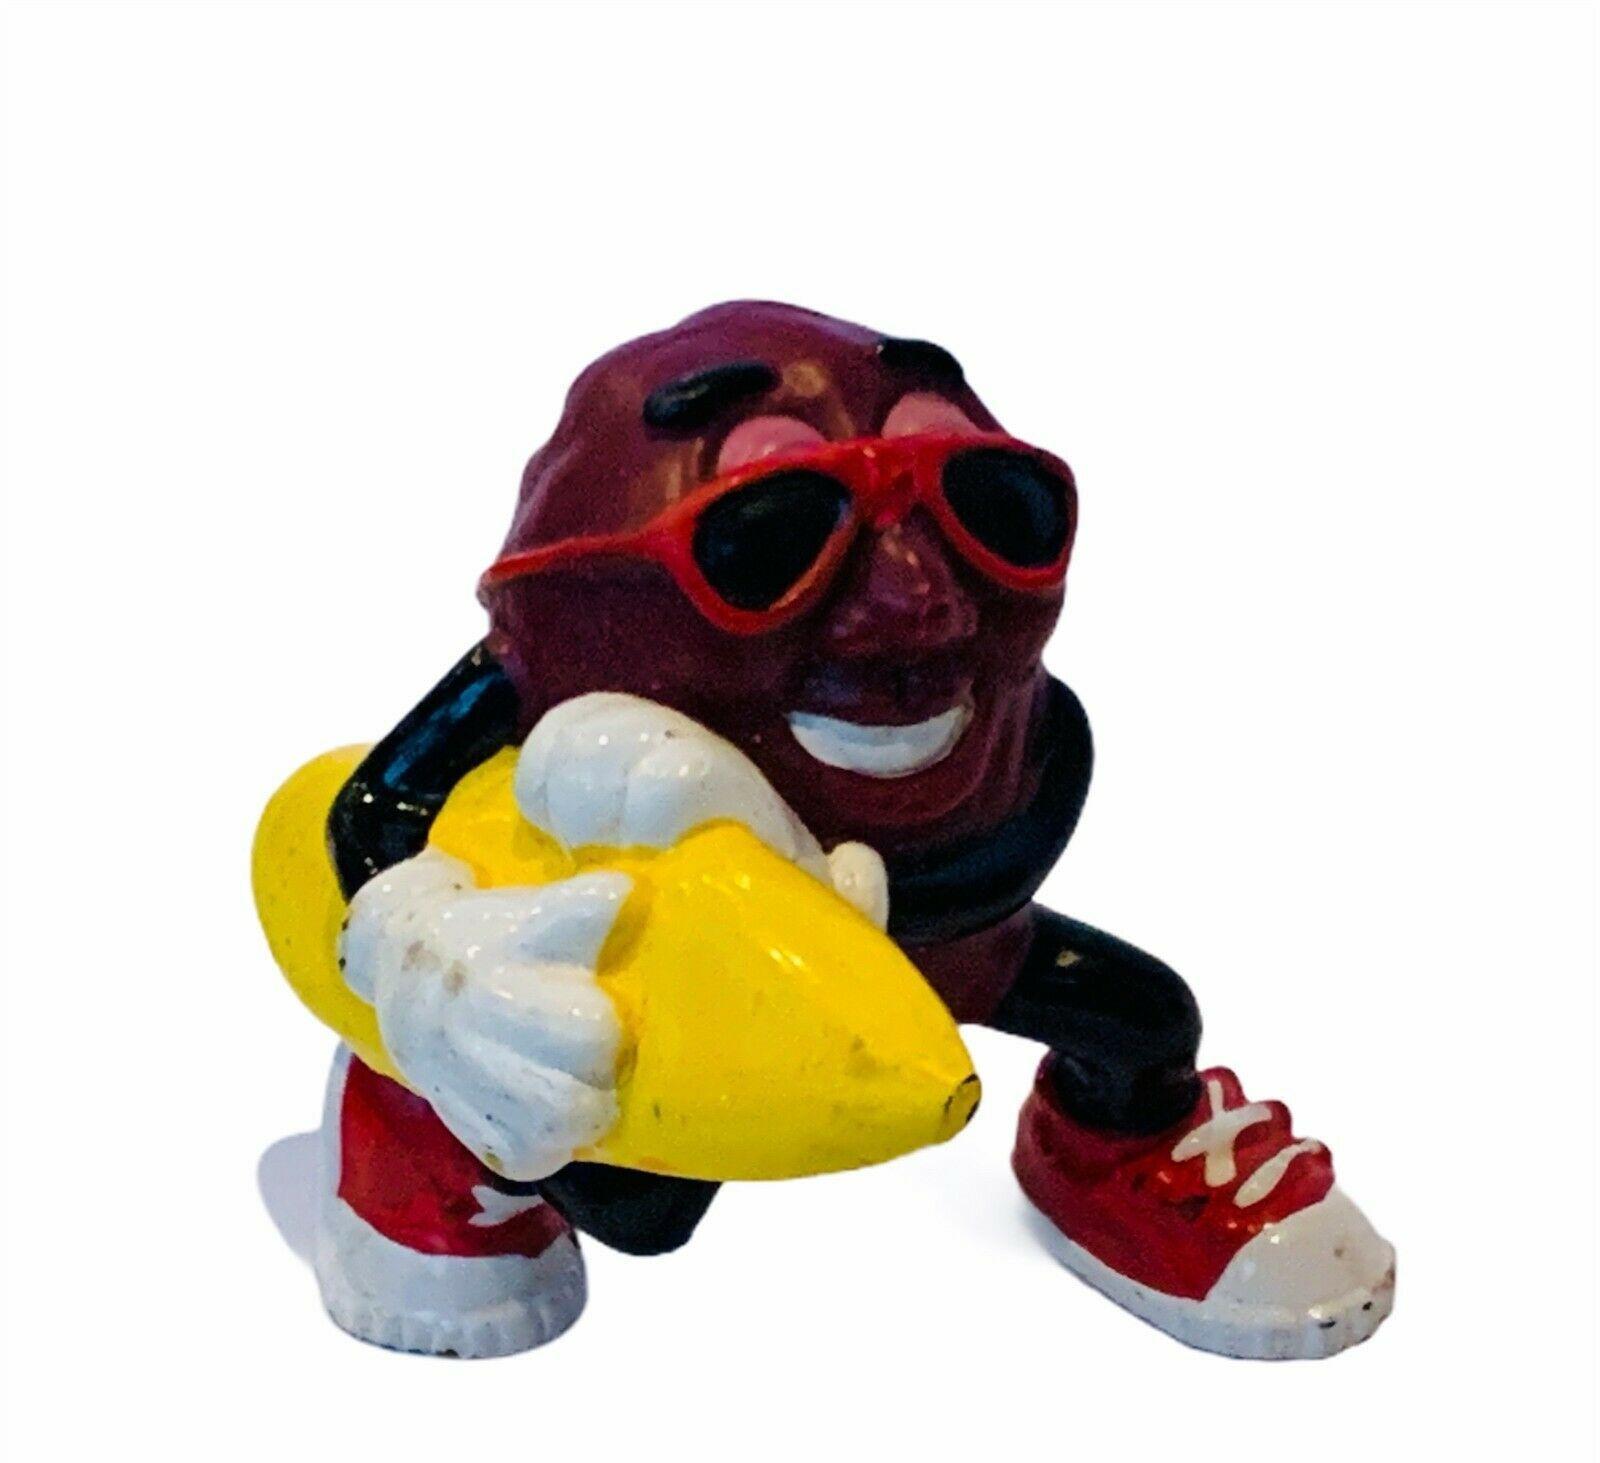 California Raisins figure applause calrab TM anthropomorphic vtg toy surf board - $16.40